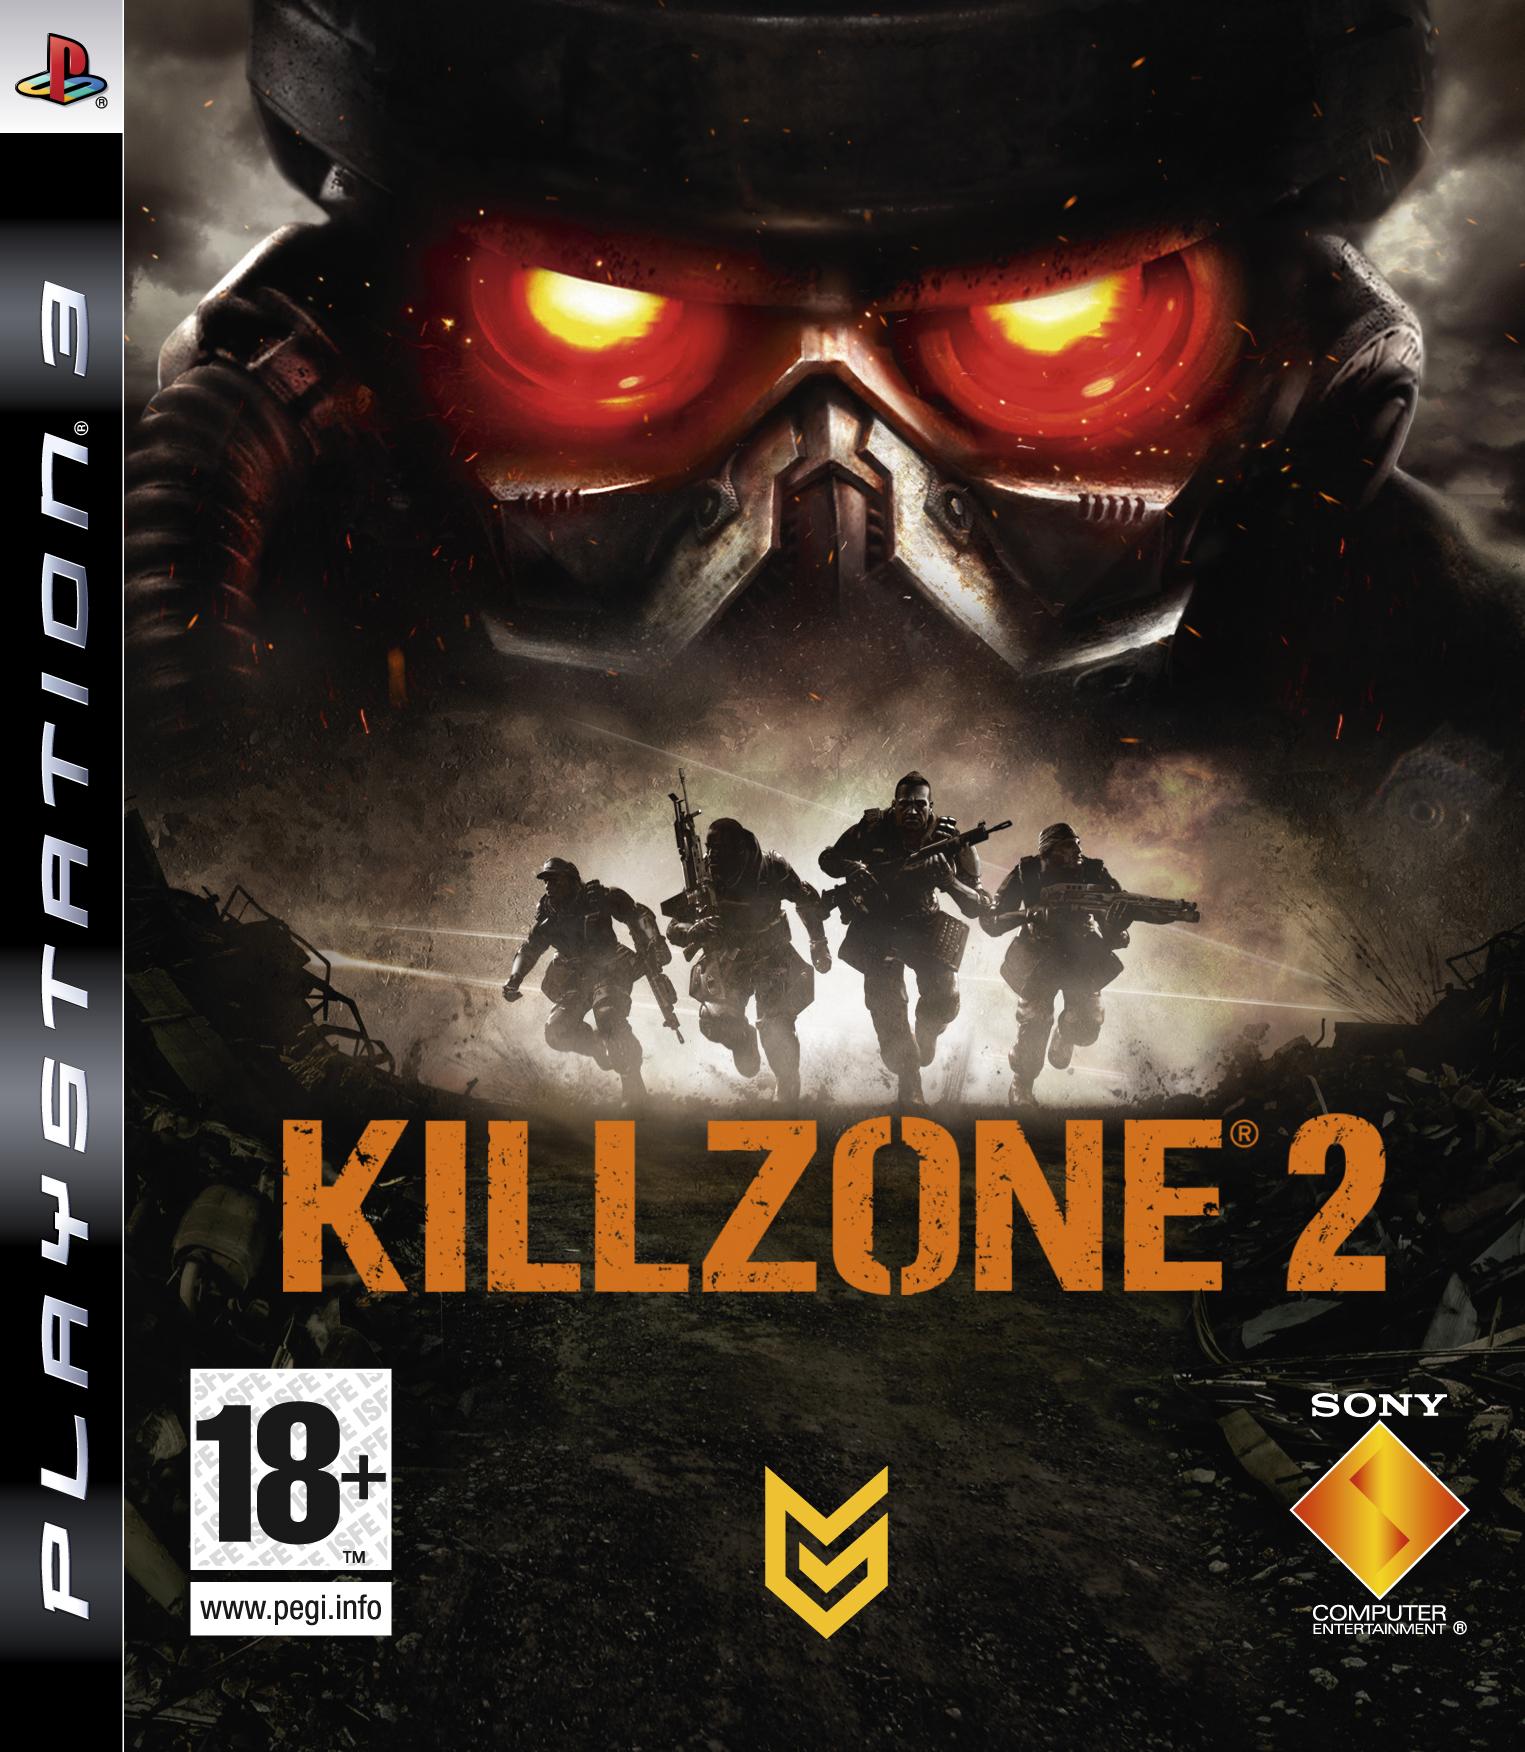 KillZone 2 Portada